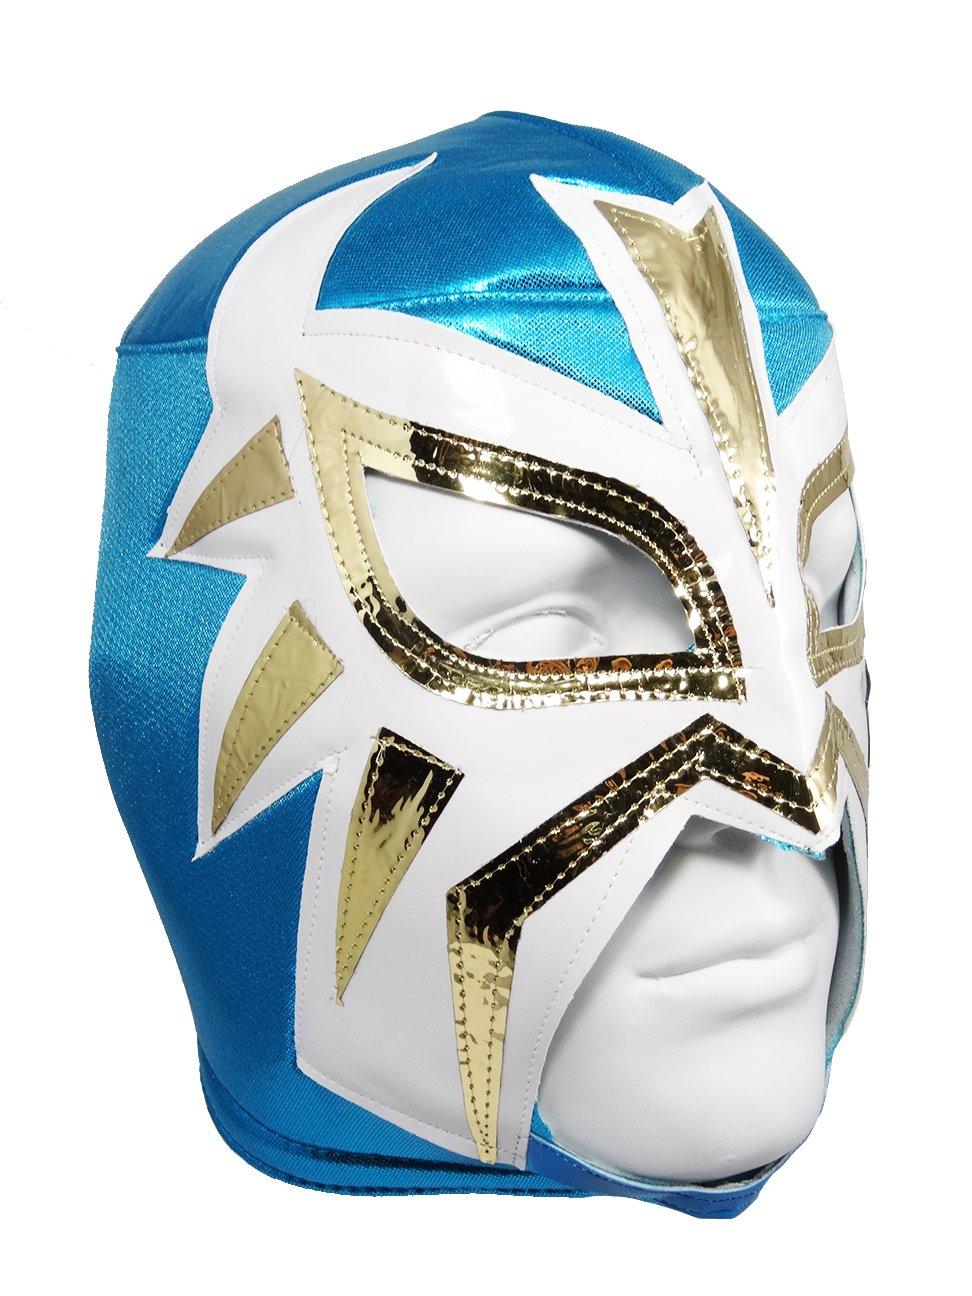 LA MASCARA Adult Lucha Libre Wrestling Mask (pro-fit) Costume Wear - Powder Blue